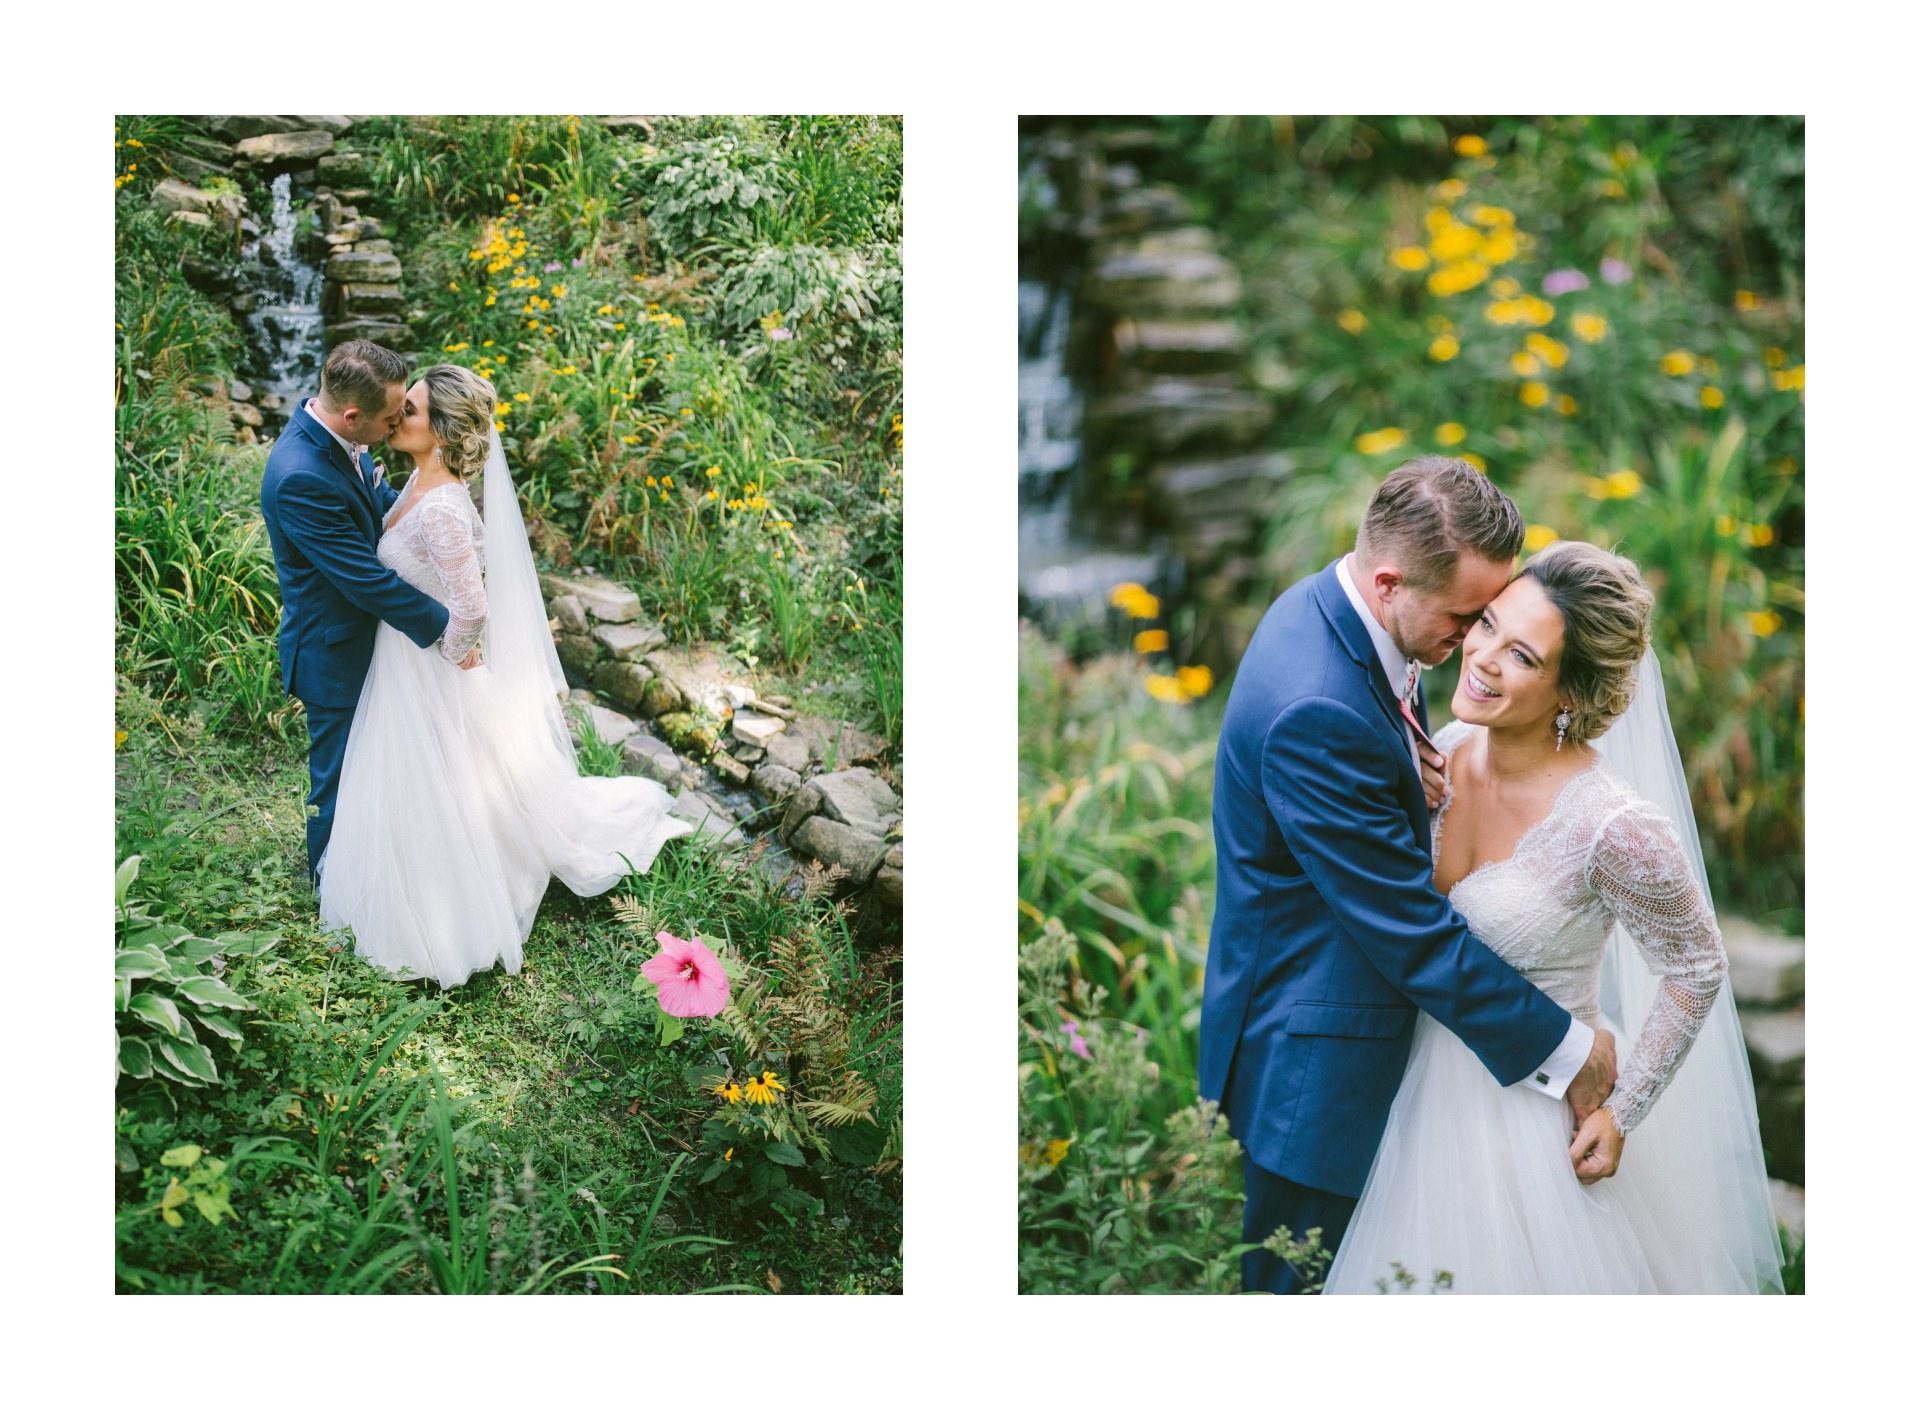 Meadow Ridge Farm Wedding Photos in Windsor 1 28.jpg